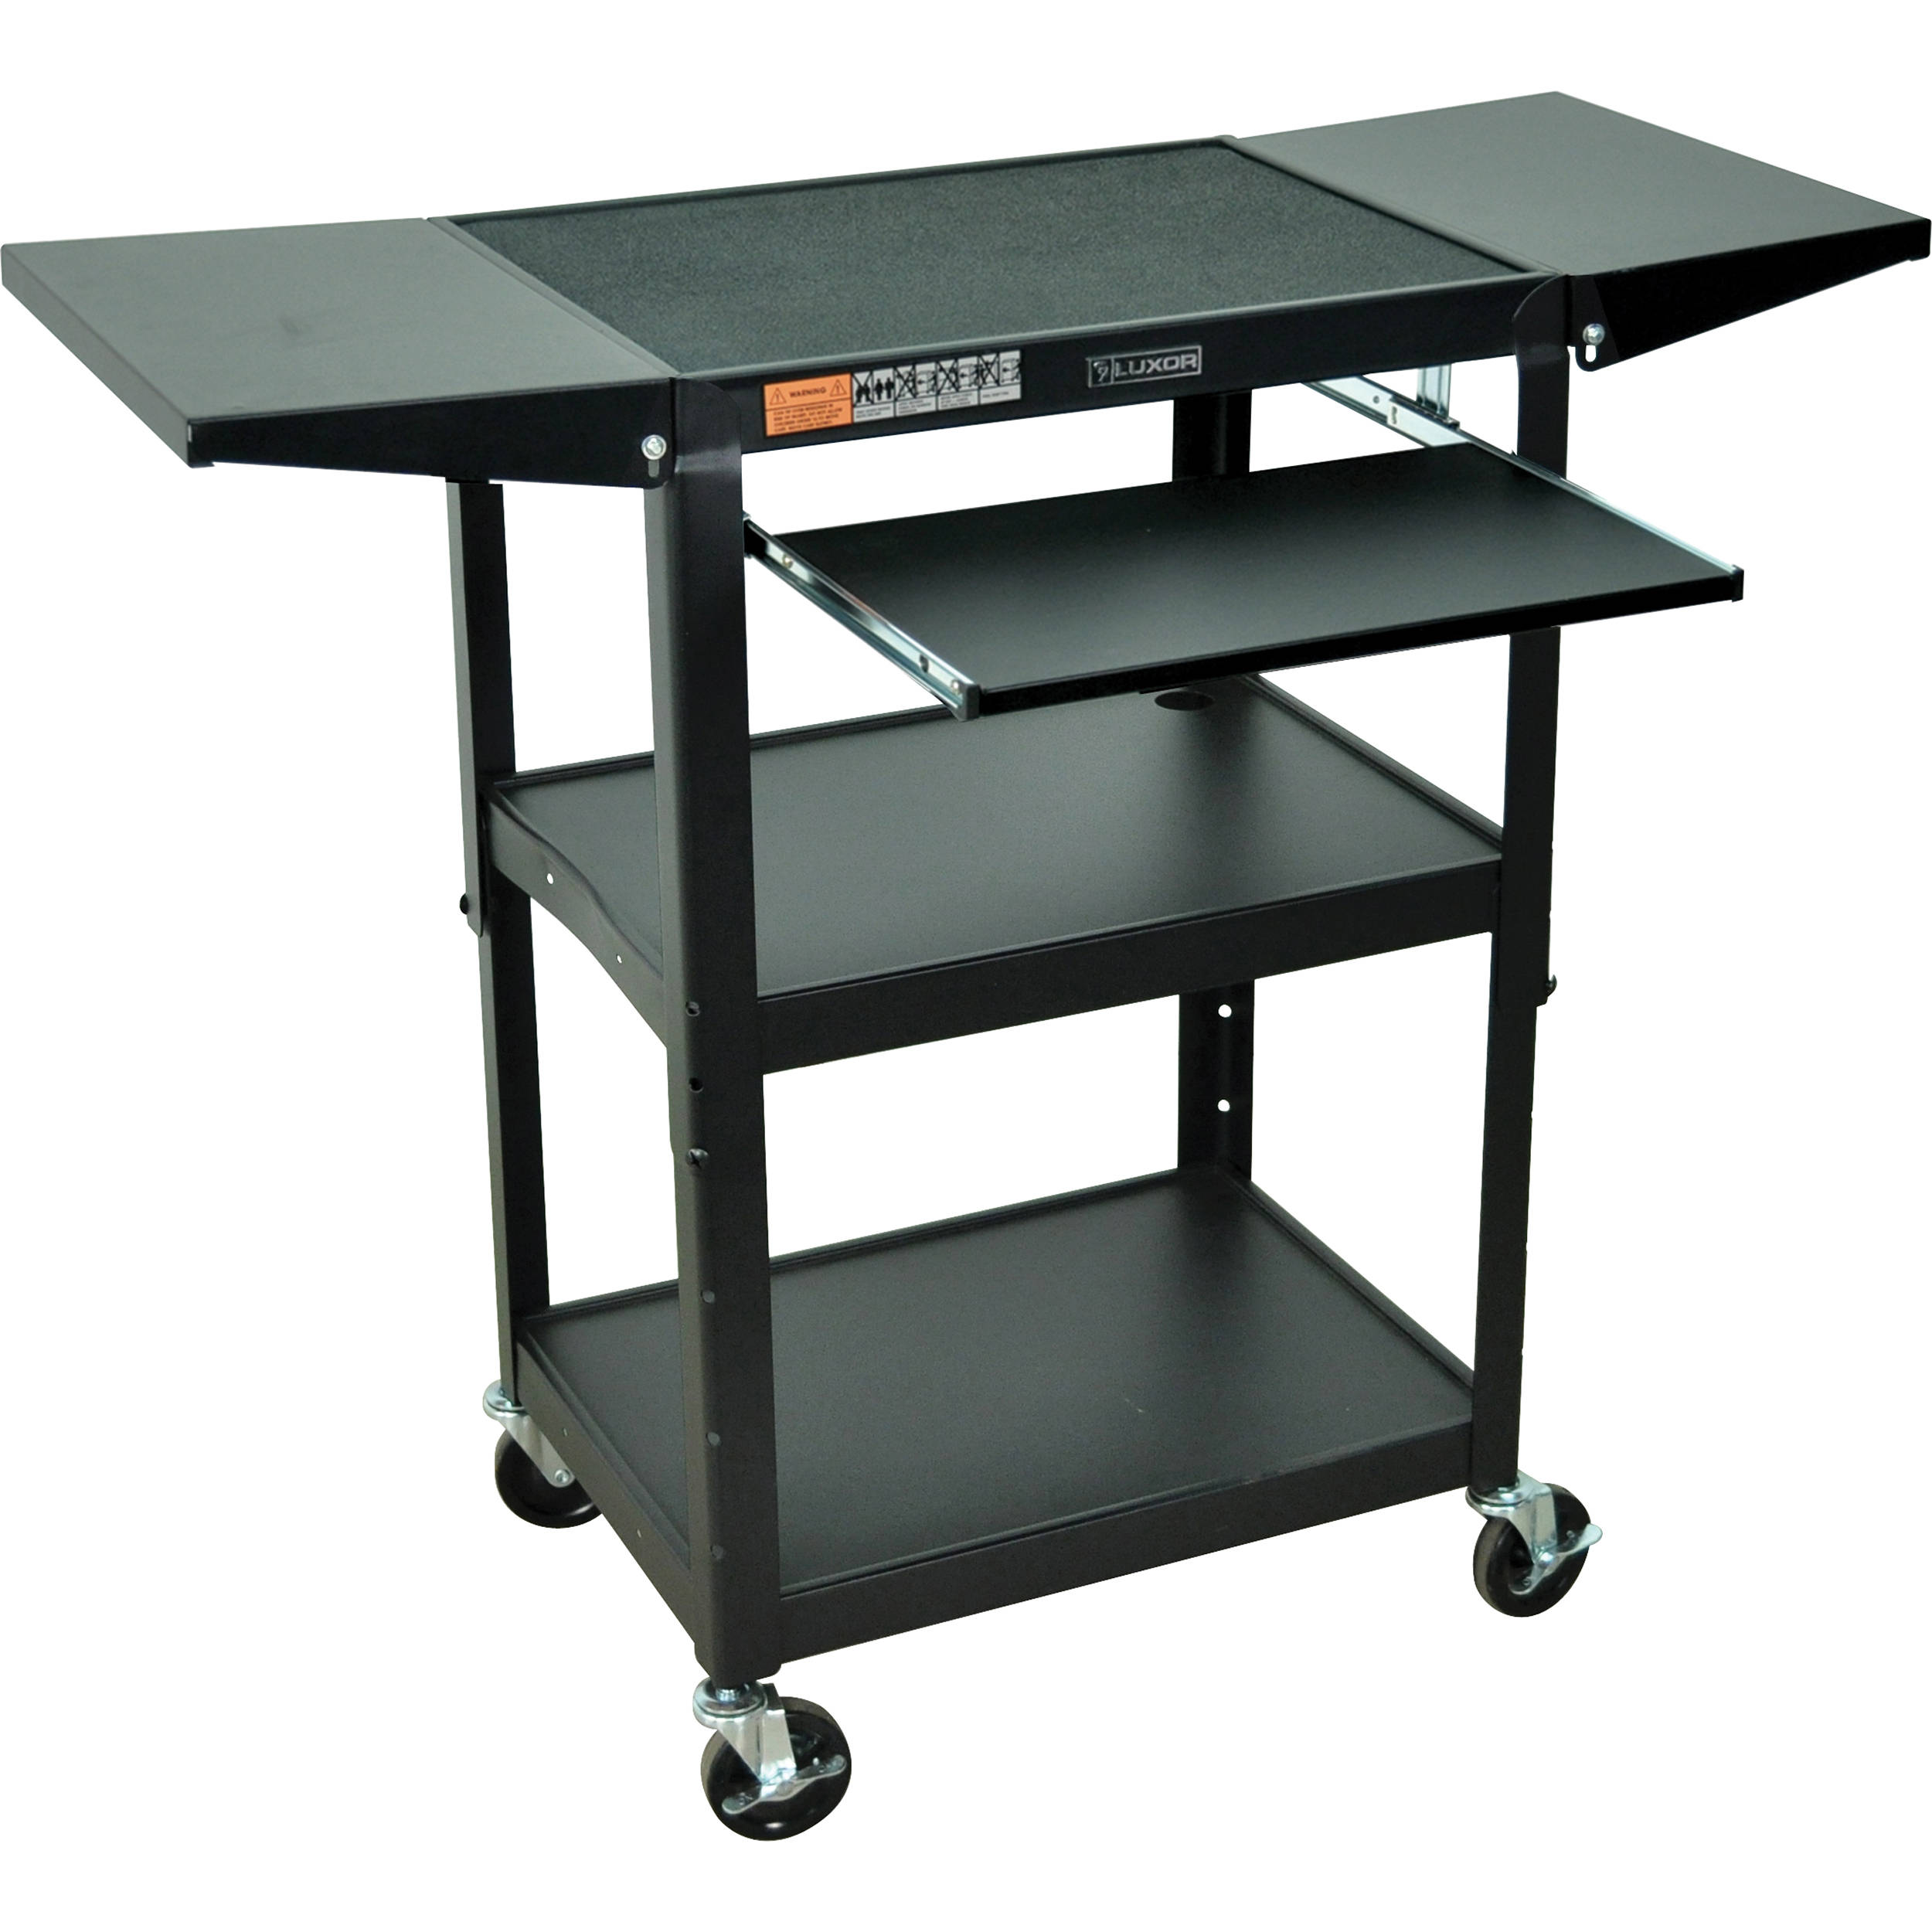 multifunction desk hayneedle computer techni product technimobilimultifunctionmobilecomputerdesk graphite mobili rolling mobile cfm options